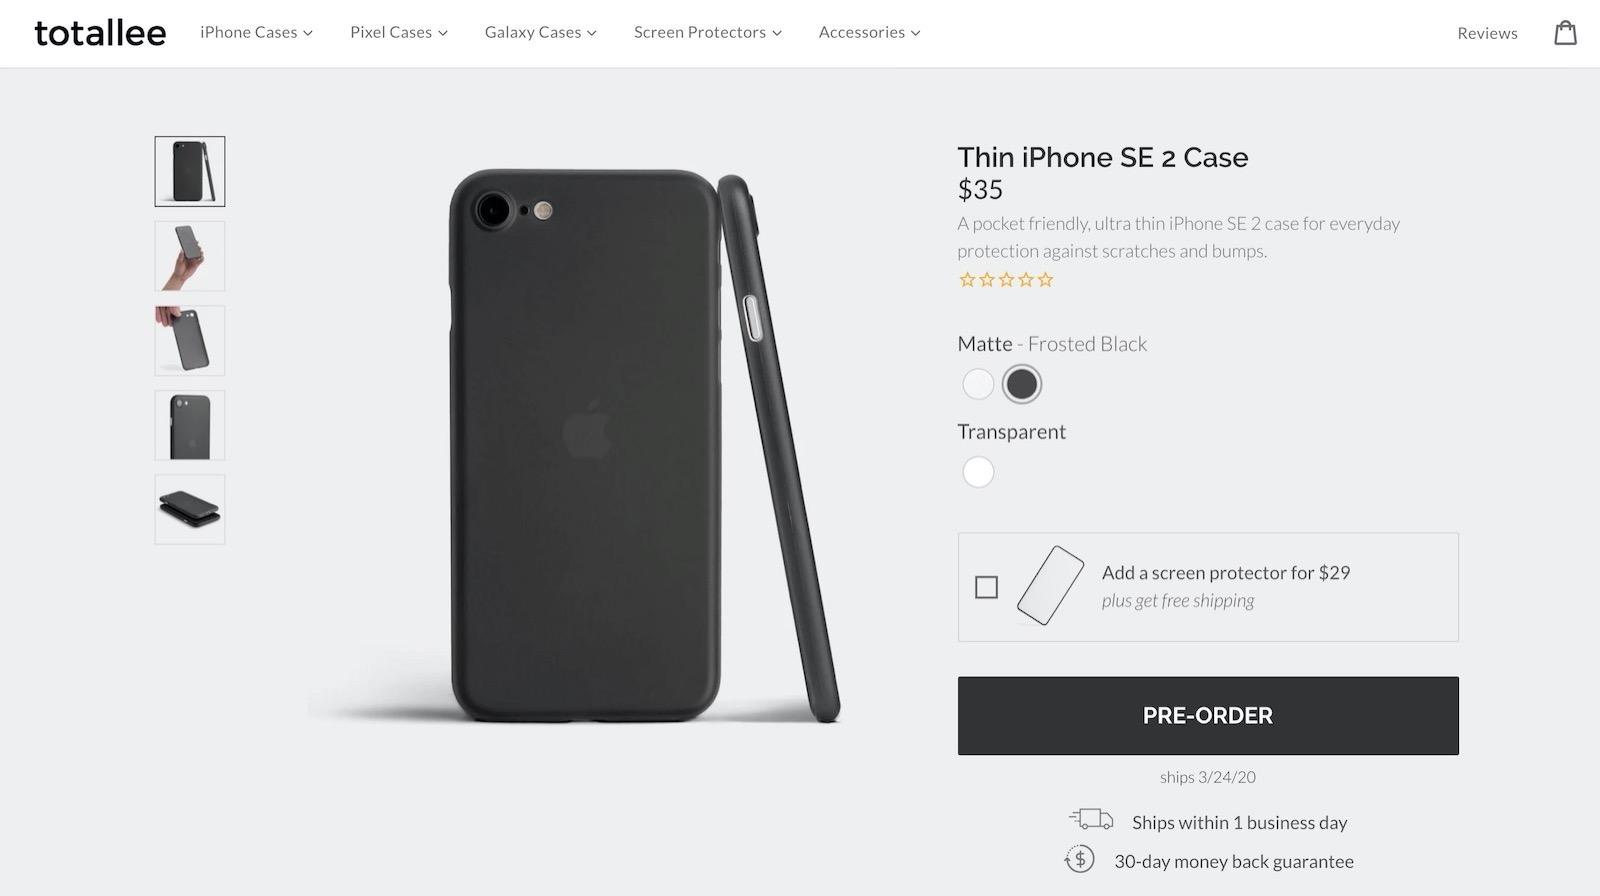 totallee-iphone-se-2-case.jpg